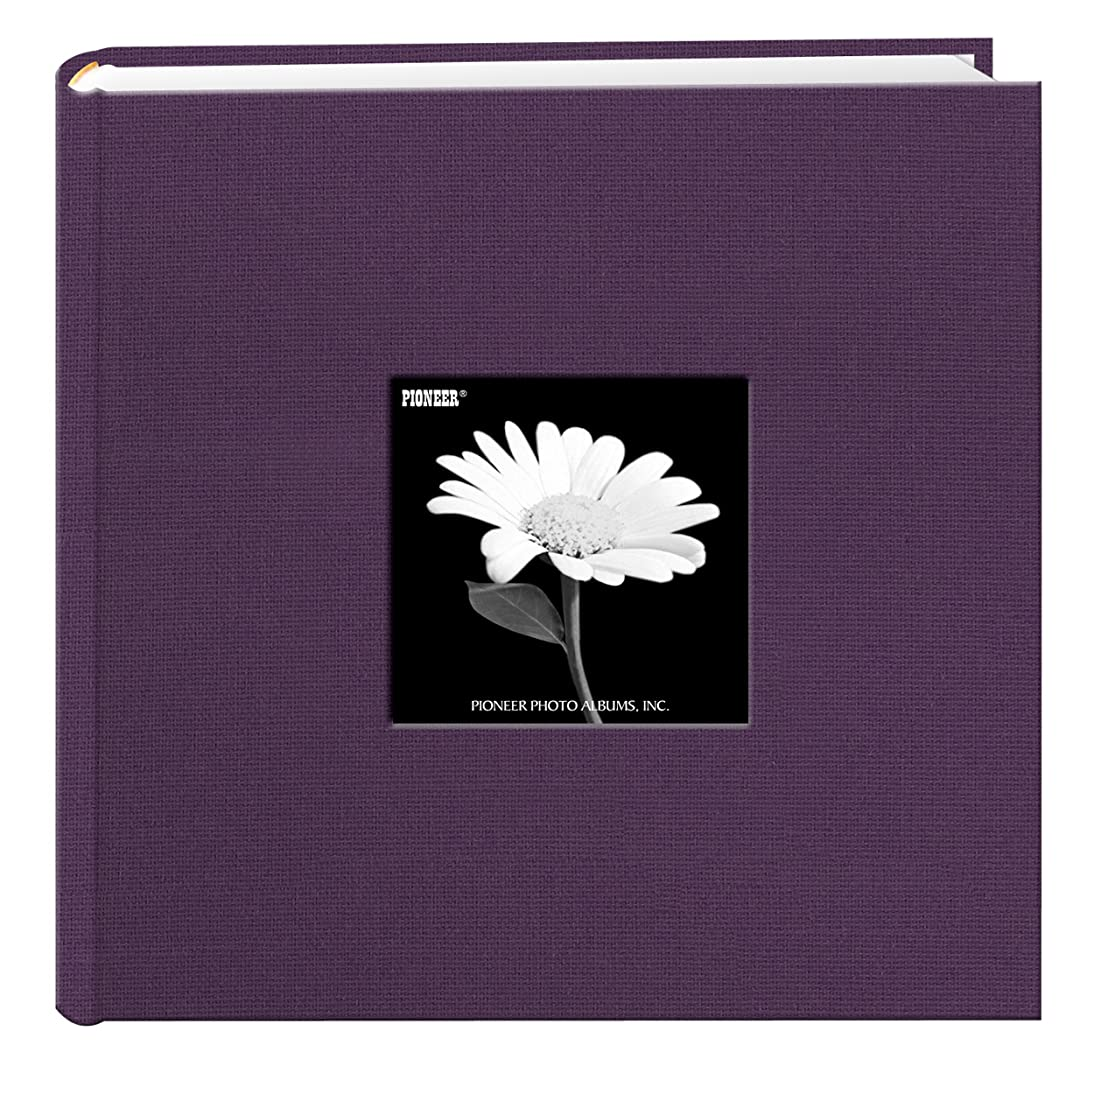 Fabric Frame Cover Photo Album 200 Pockets Hold 4x6 Photos, Wildberry Purple